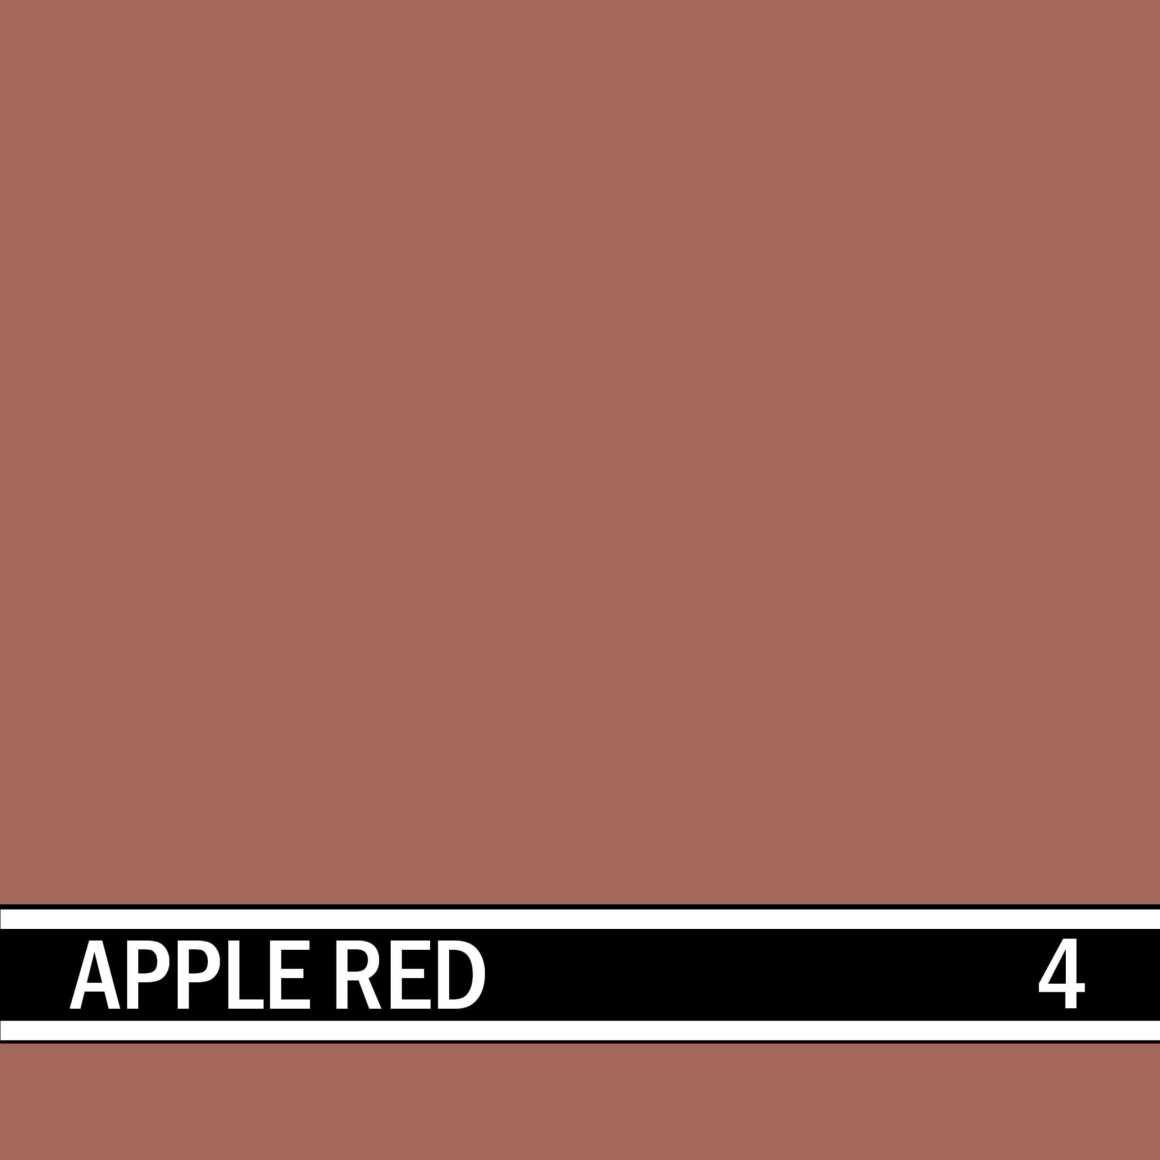 Apple Red integral concrete color for stamped concrete and decorative colored concrete